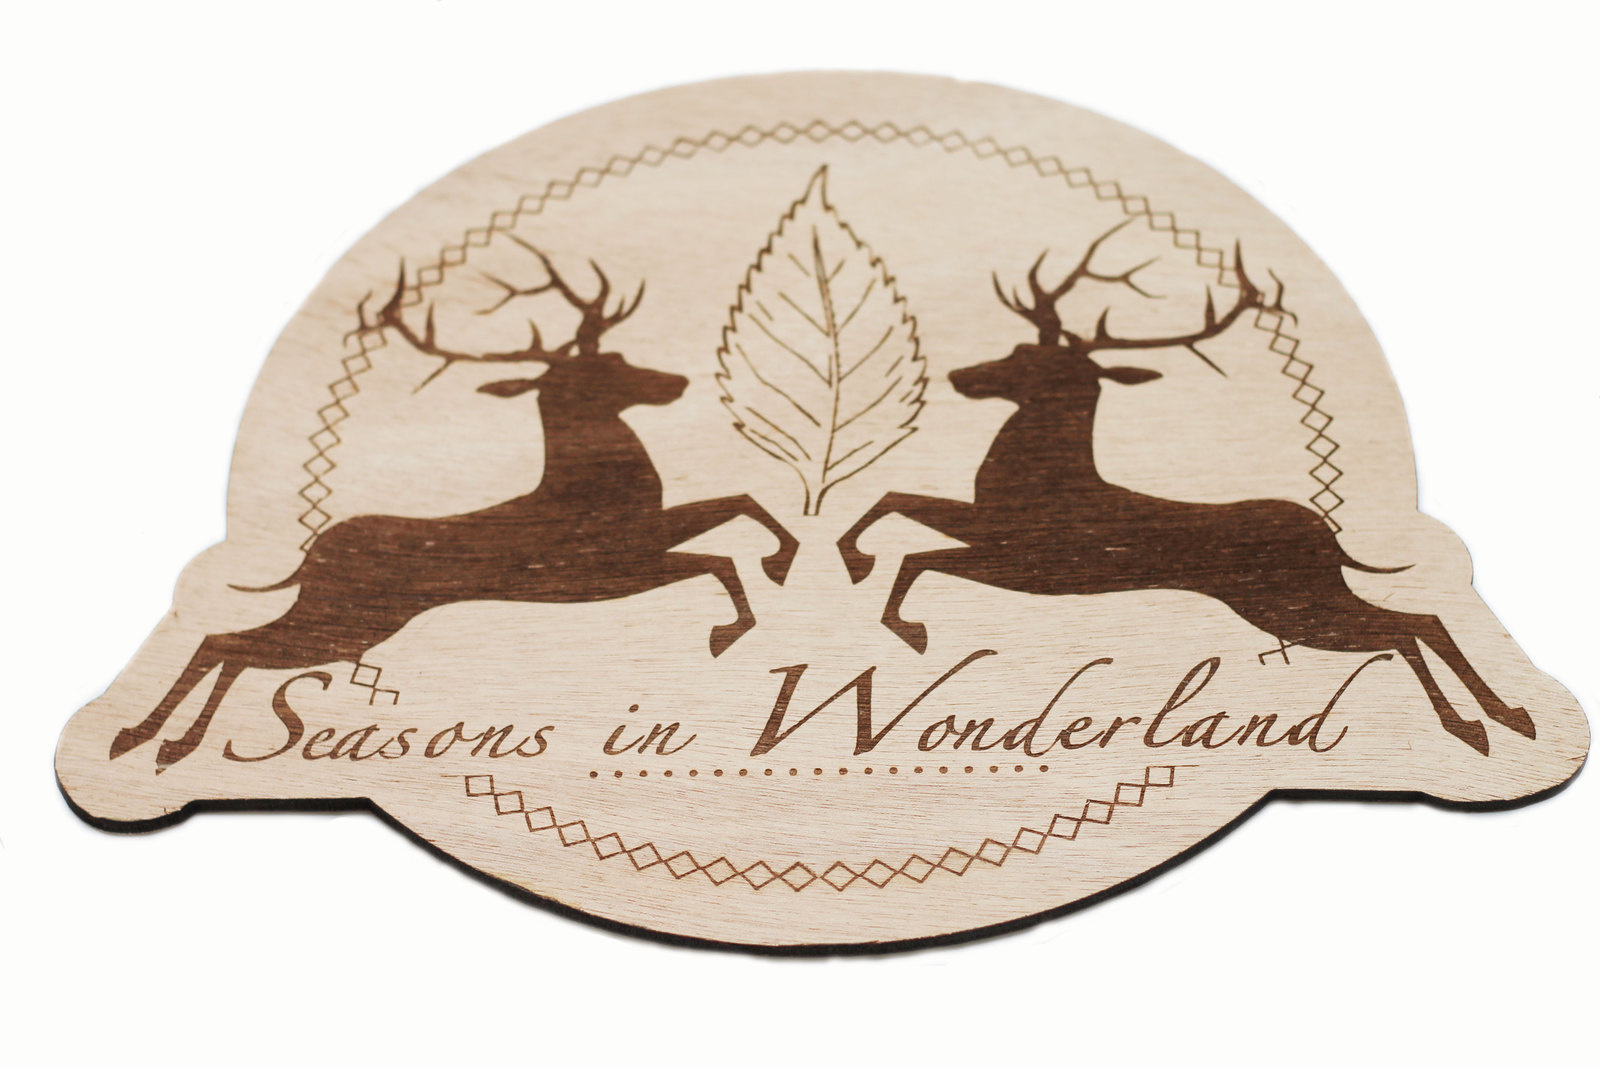 ob_a483bc_logo-bois-seasons-in-wonderland-1505552539.jpg